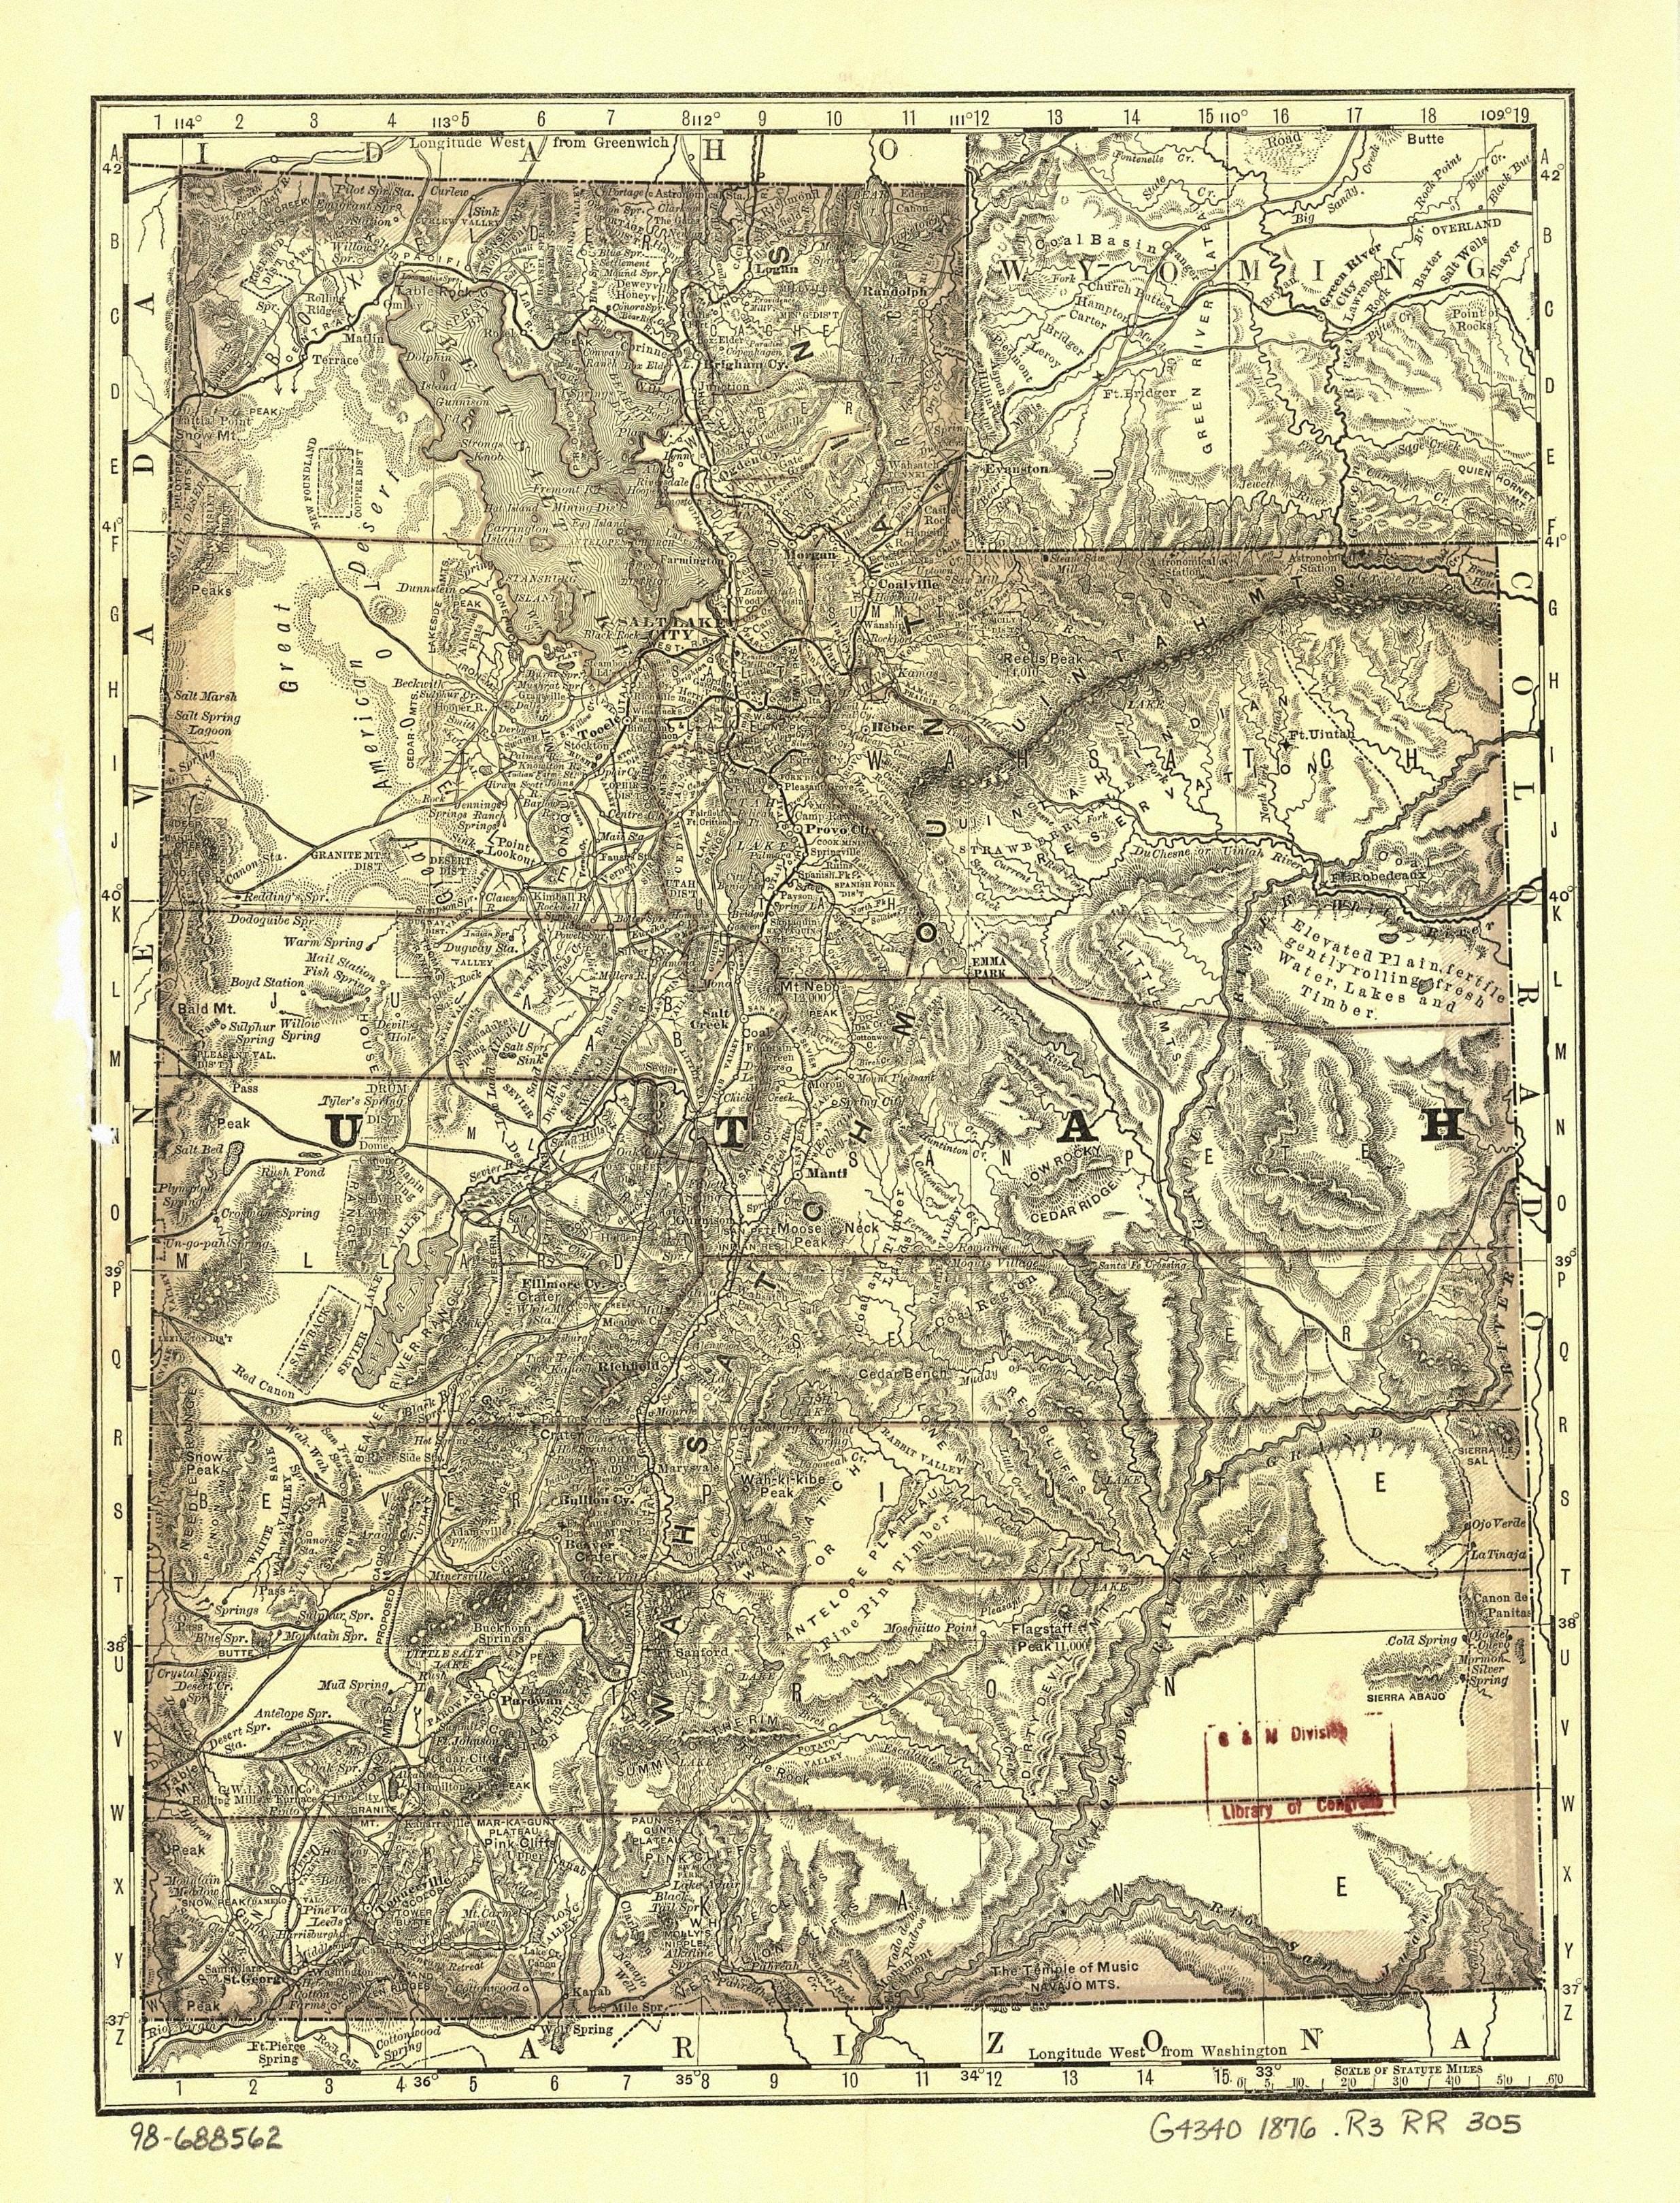 Washington County Maps And Charts - 1889 us railroad map